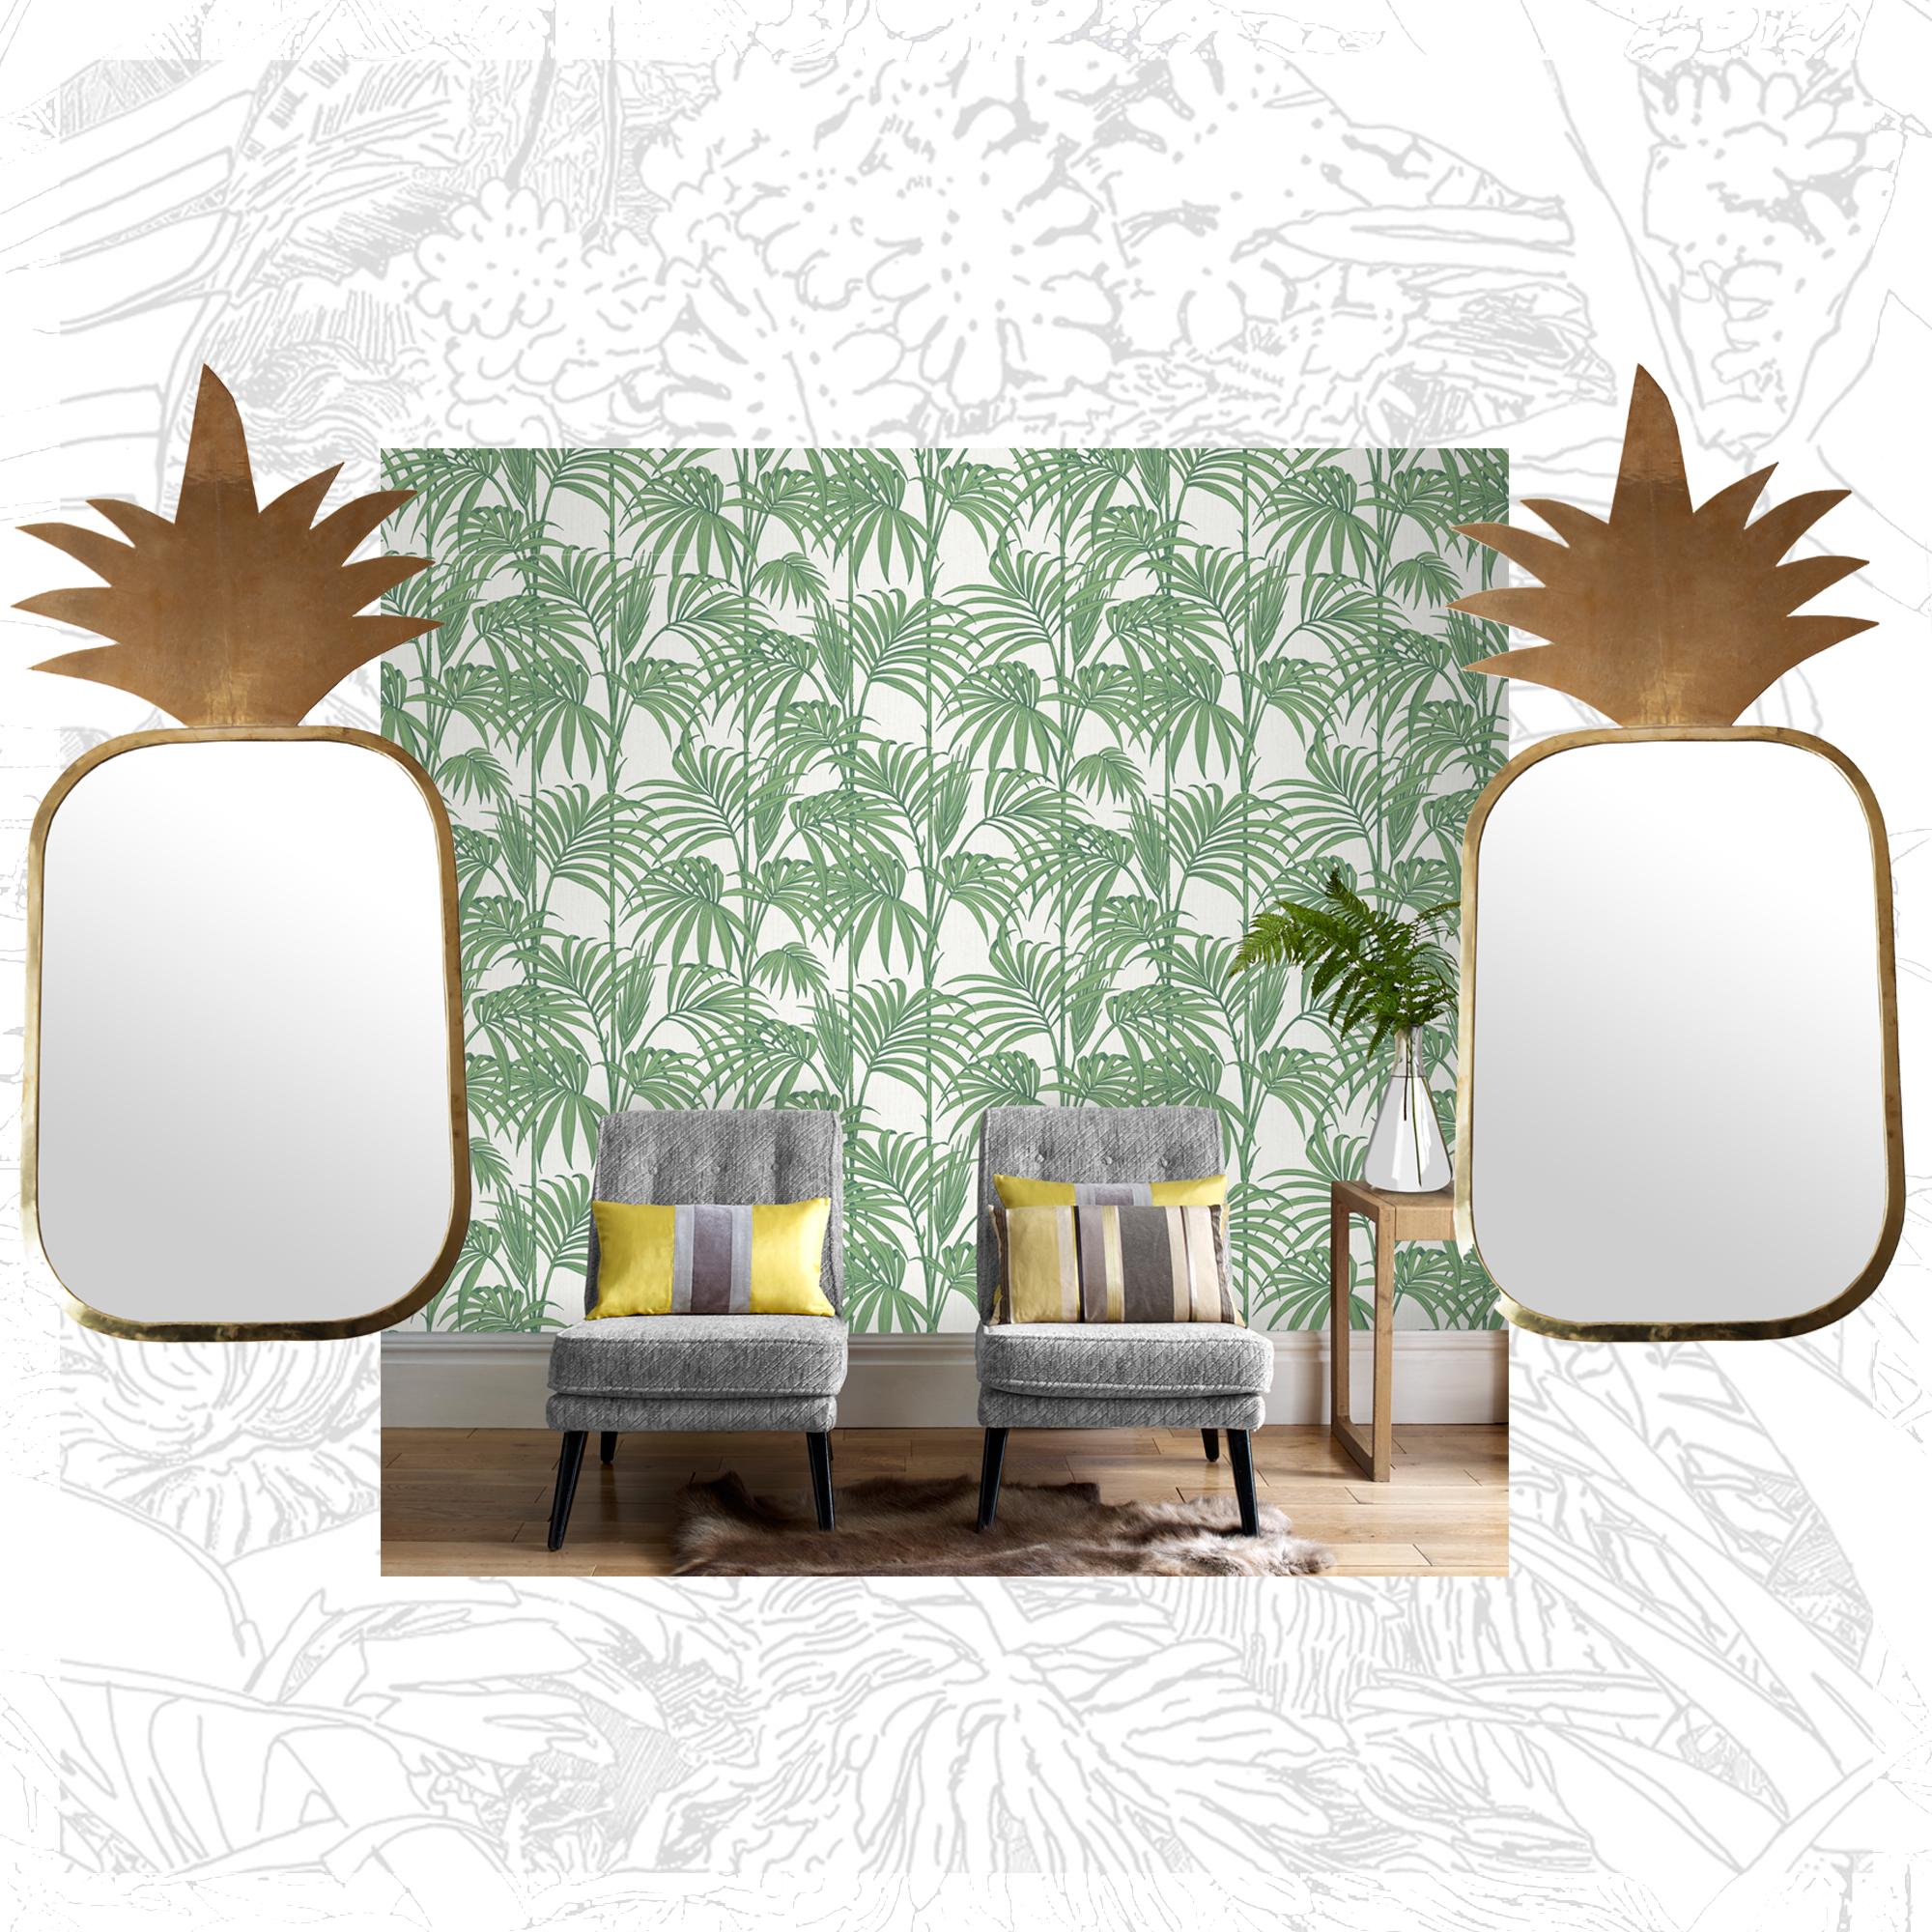 decoration exotique 3 styles elle d coration. Black Bedroom Furniture Sets. Home Design Ideas